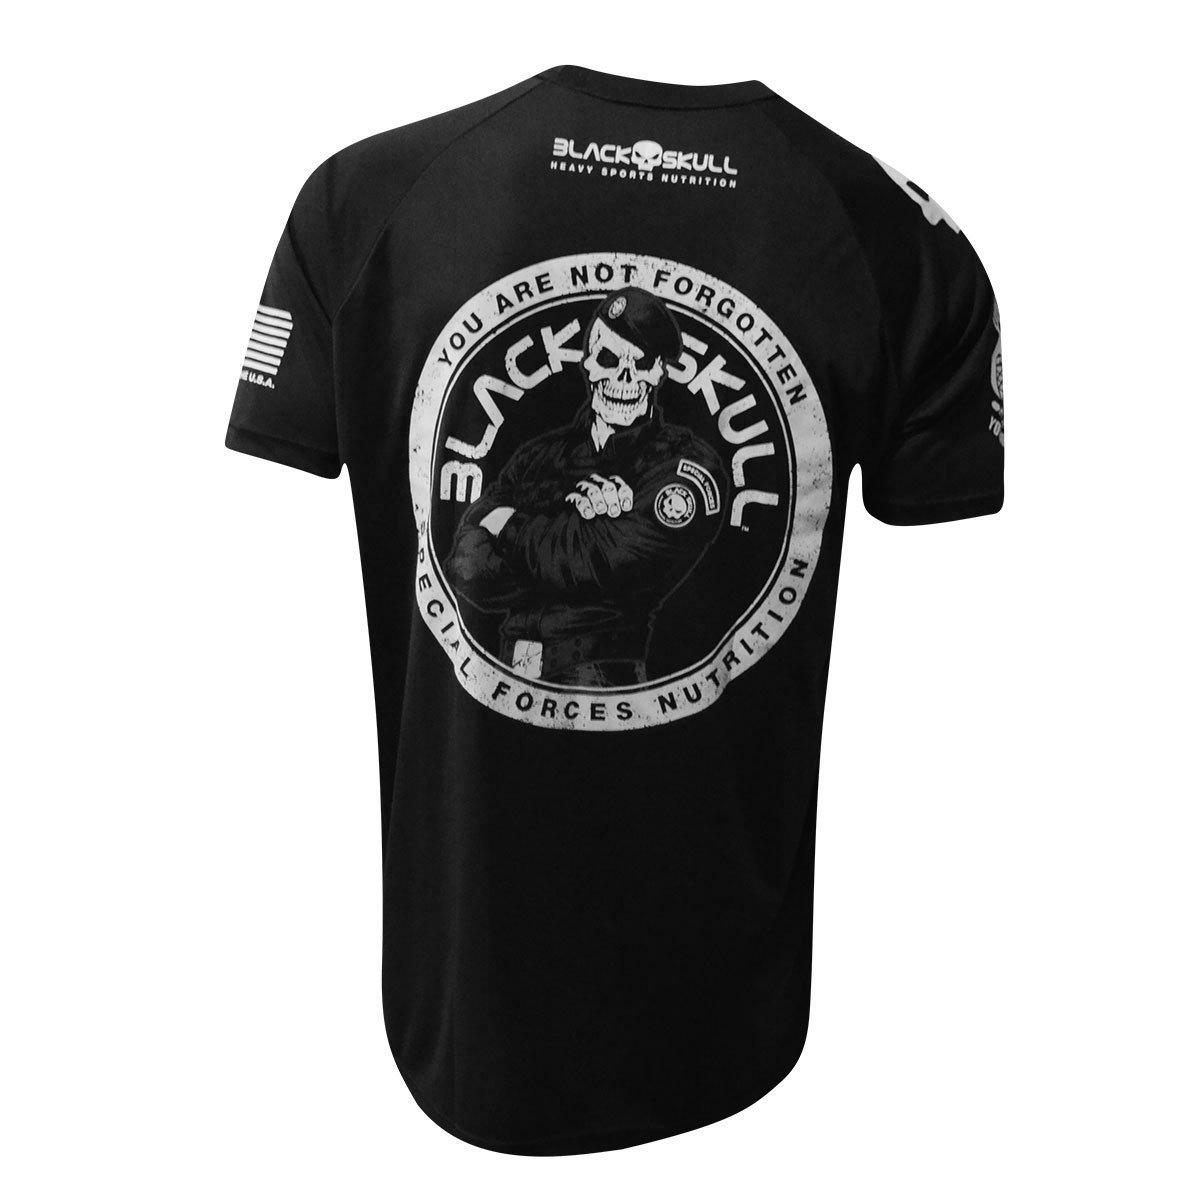 Camiseta Dry Fit Soldado Bope Black Skull Masculina - Compre Agora ... 1d827363b06